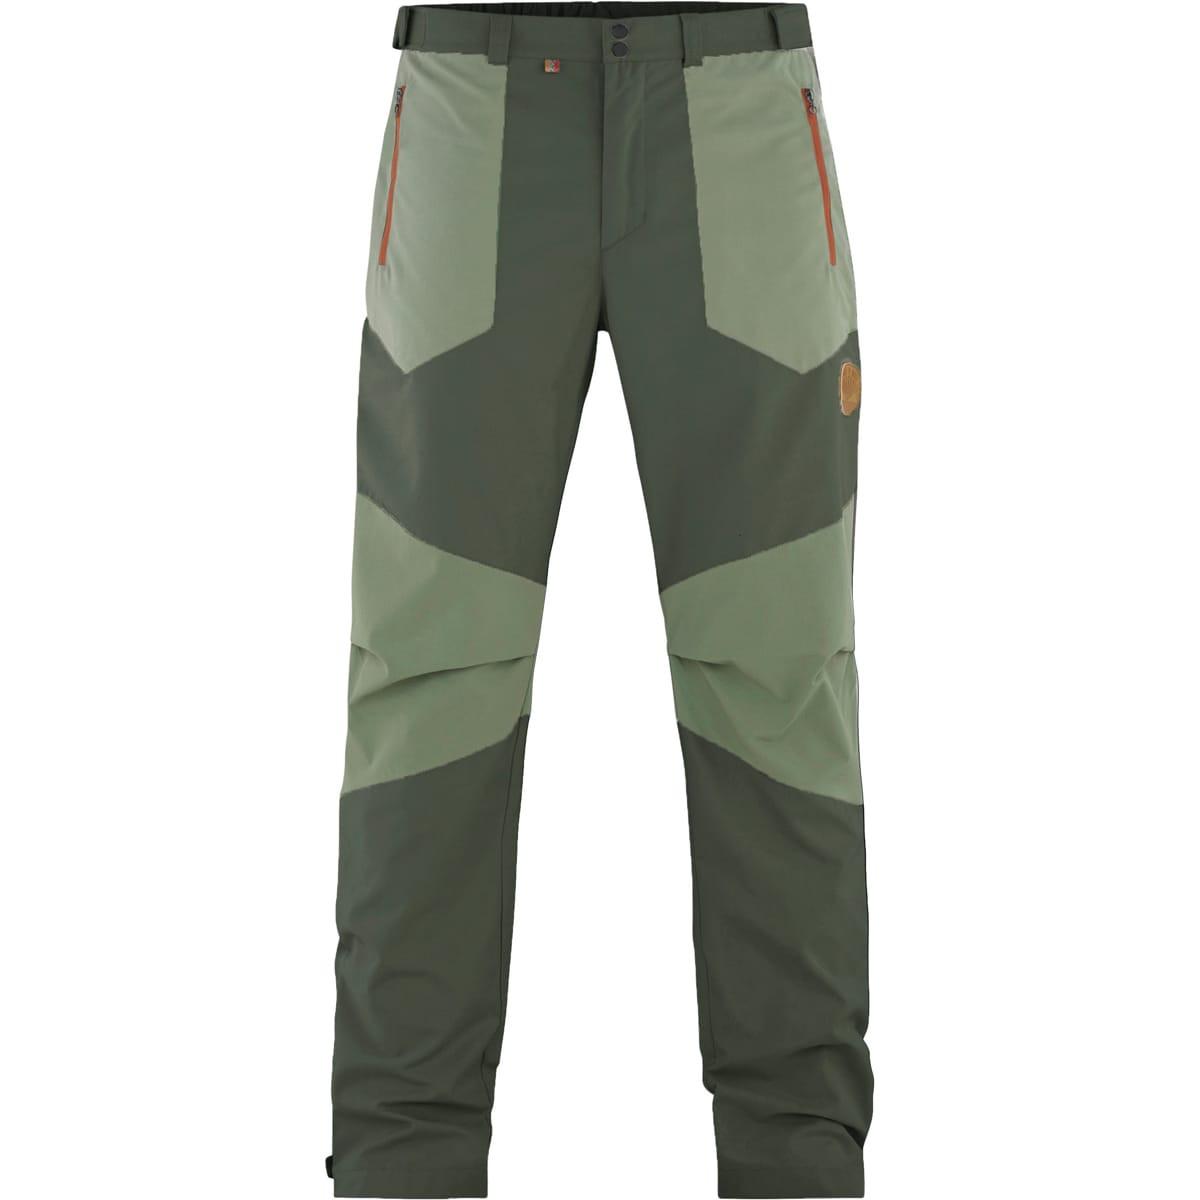 Bula  Swell Trekking Pants